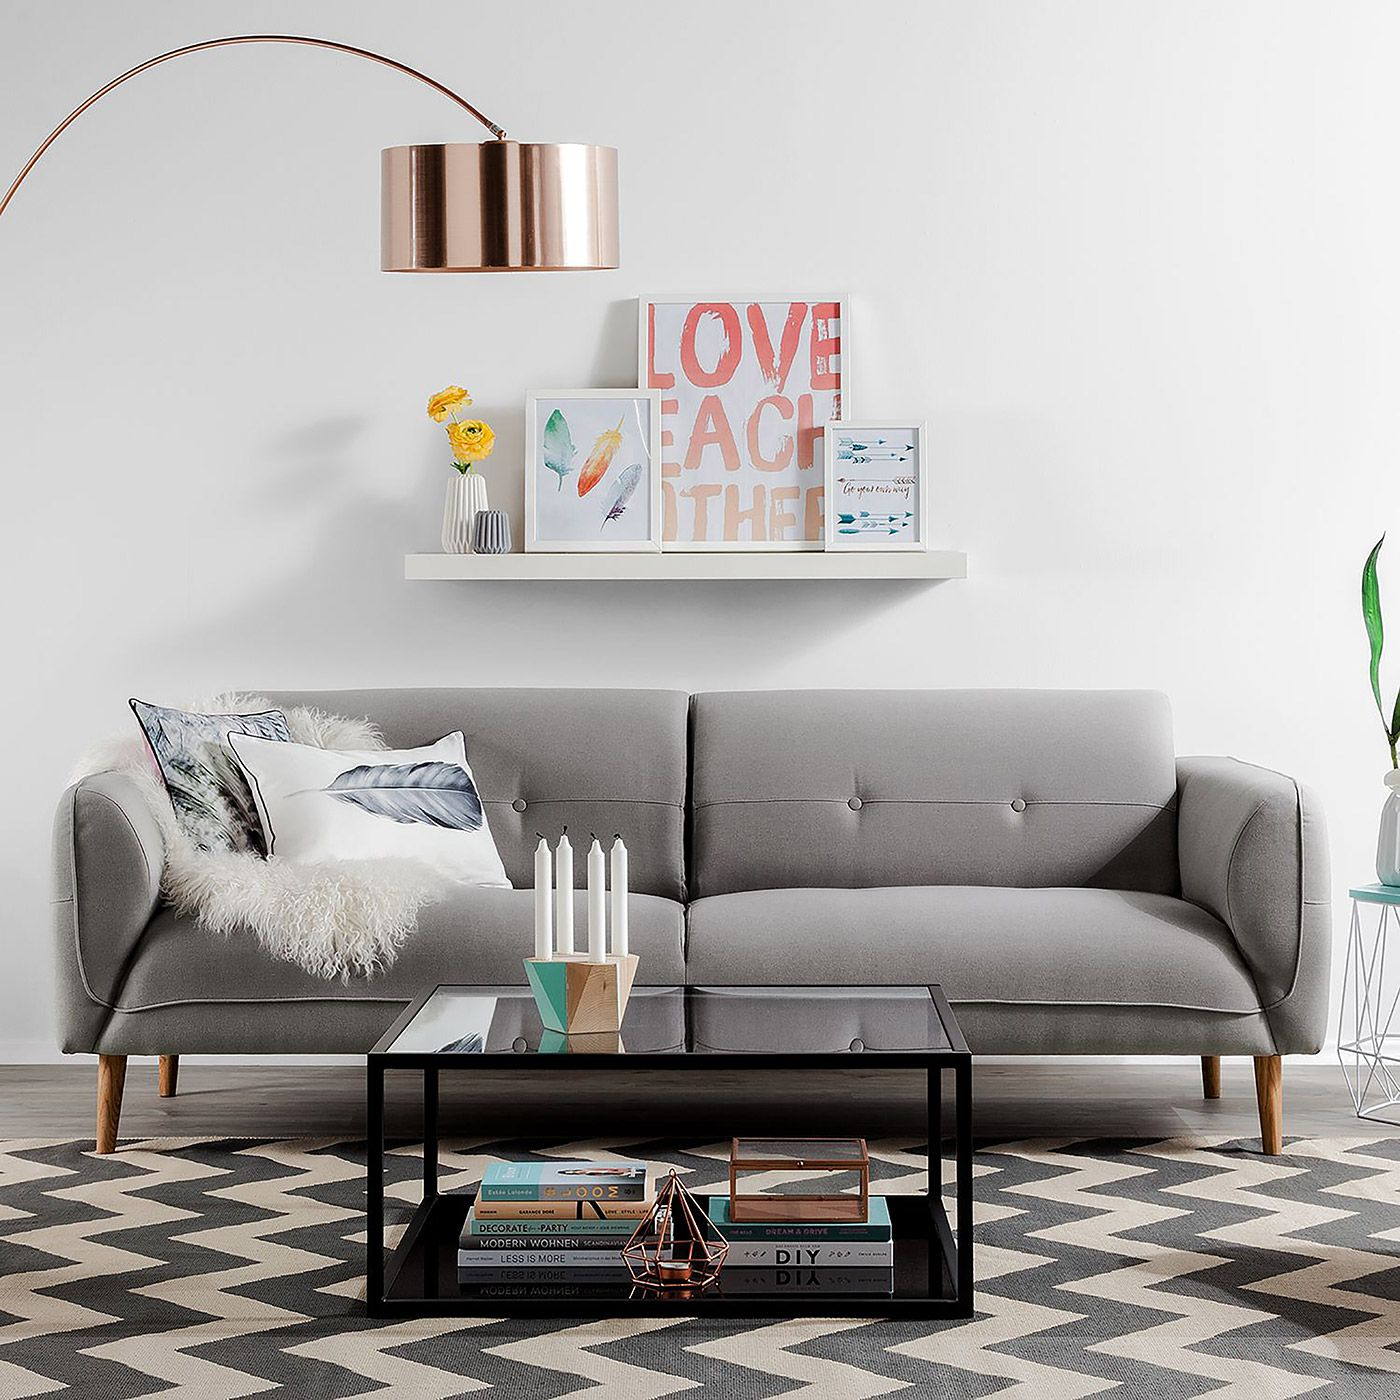 Home24 Scandinavian Design Furniture Mindsparkle Mag Interior Design Furniture Scandinavian Furniture Design Sofa Furniture